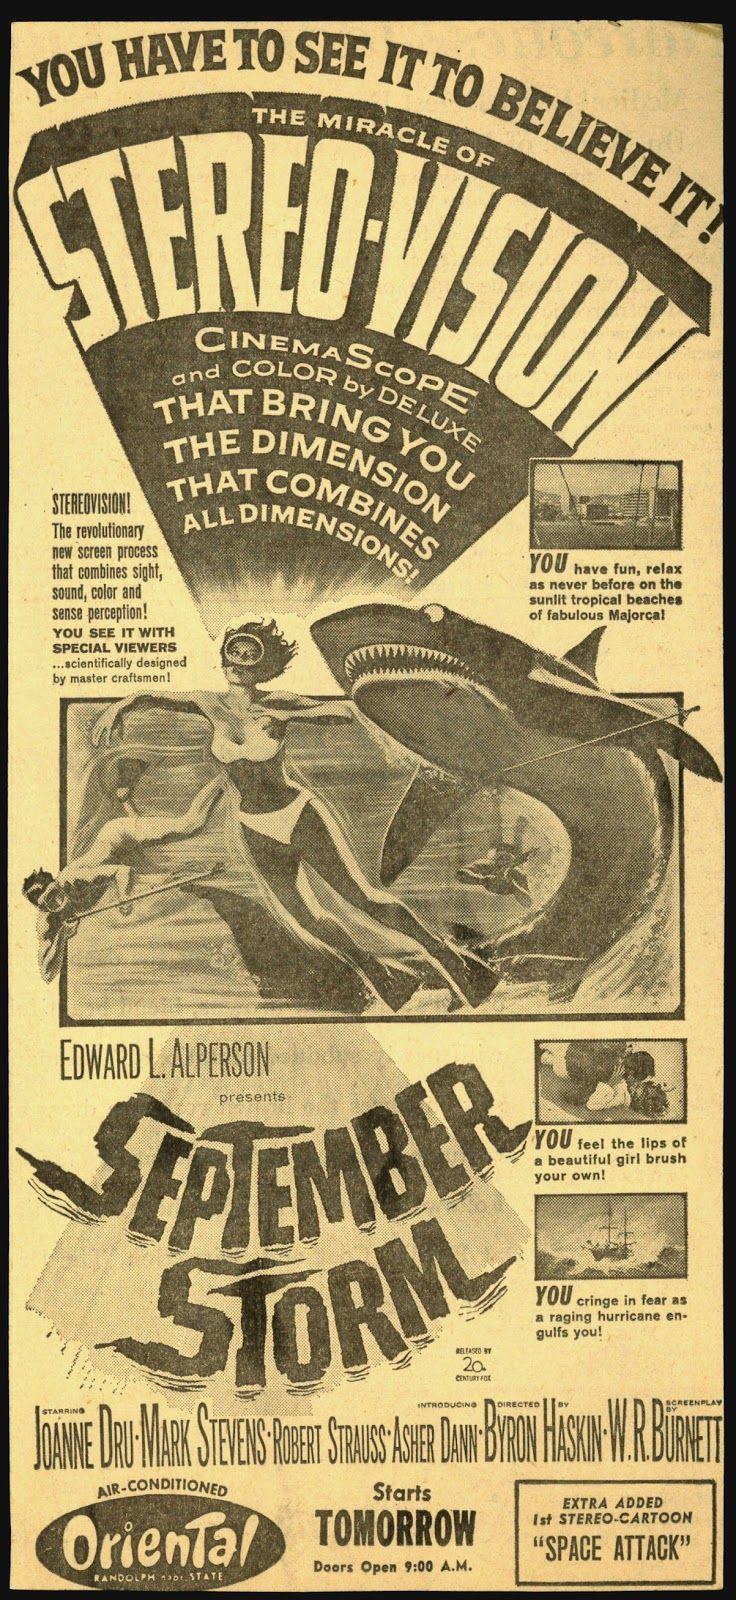 SEPTEMBER STORM (1960) - Shot in 3-D - Joanne Dru - Mark Stevens - Robert Strauss - Asher Dann - Directed by Byron Haskin - 20th Century-Fox - Newspaper Ad.